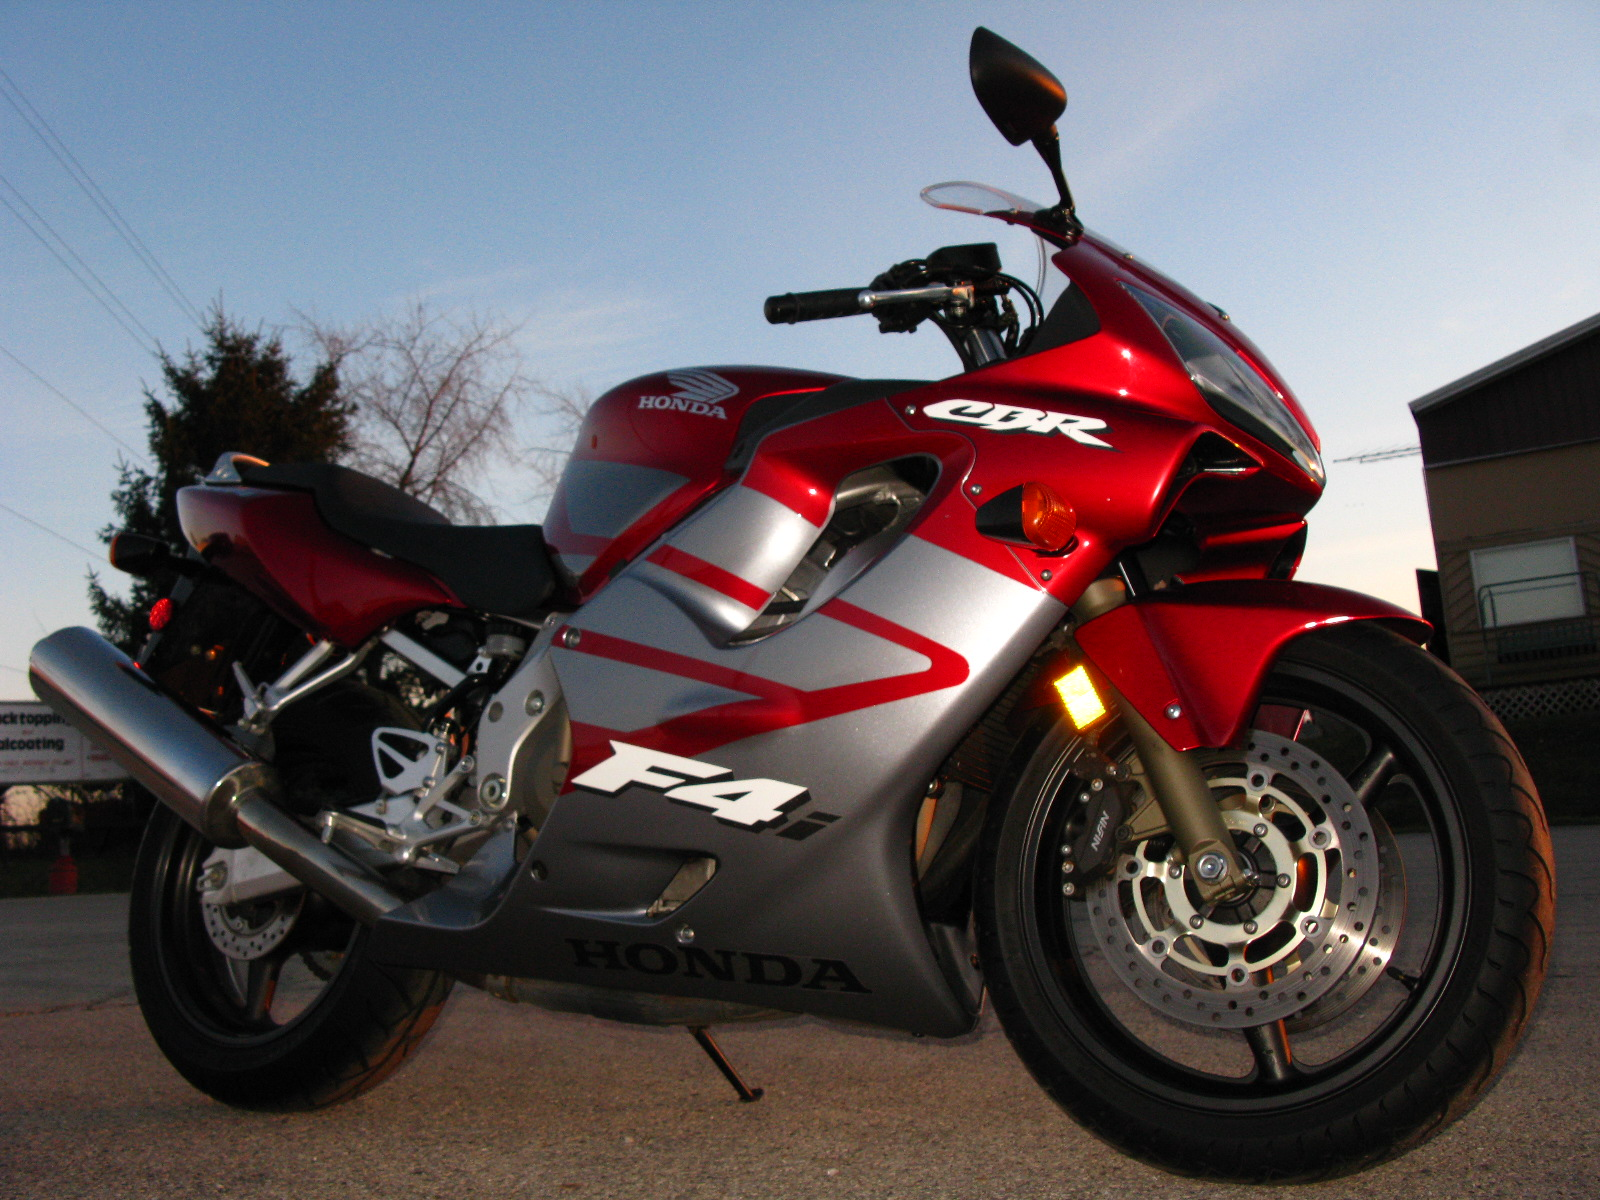 http://3.bp.blogspot.com/_rqqtSGINUiY/TPUnfsK2jxI/AAAAAAAAAFs/RRs3bd1FCzA/s1600/Sports+Bike+Hero+Honda+CBR+images.jpg